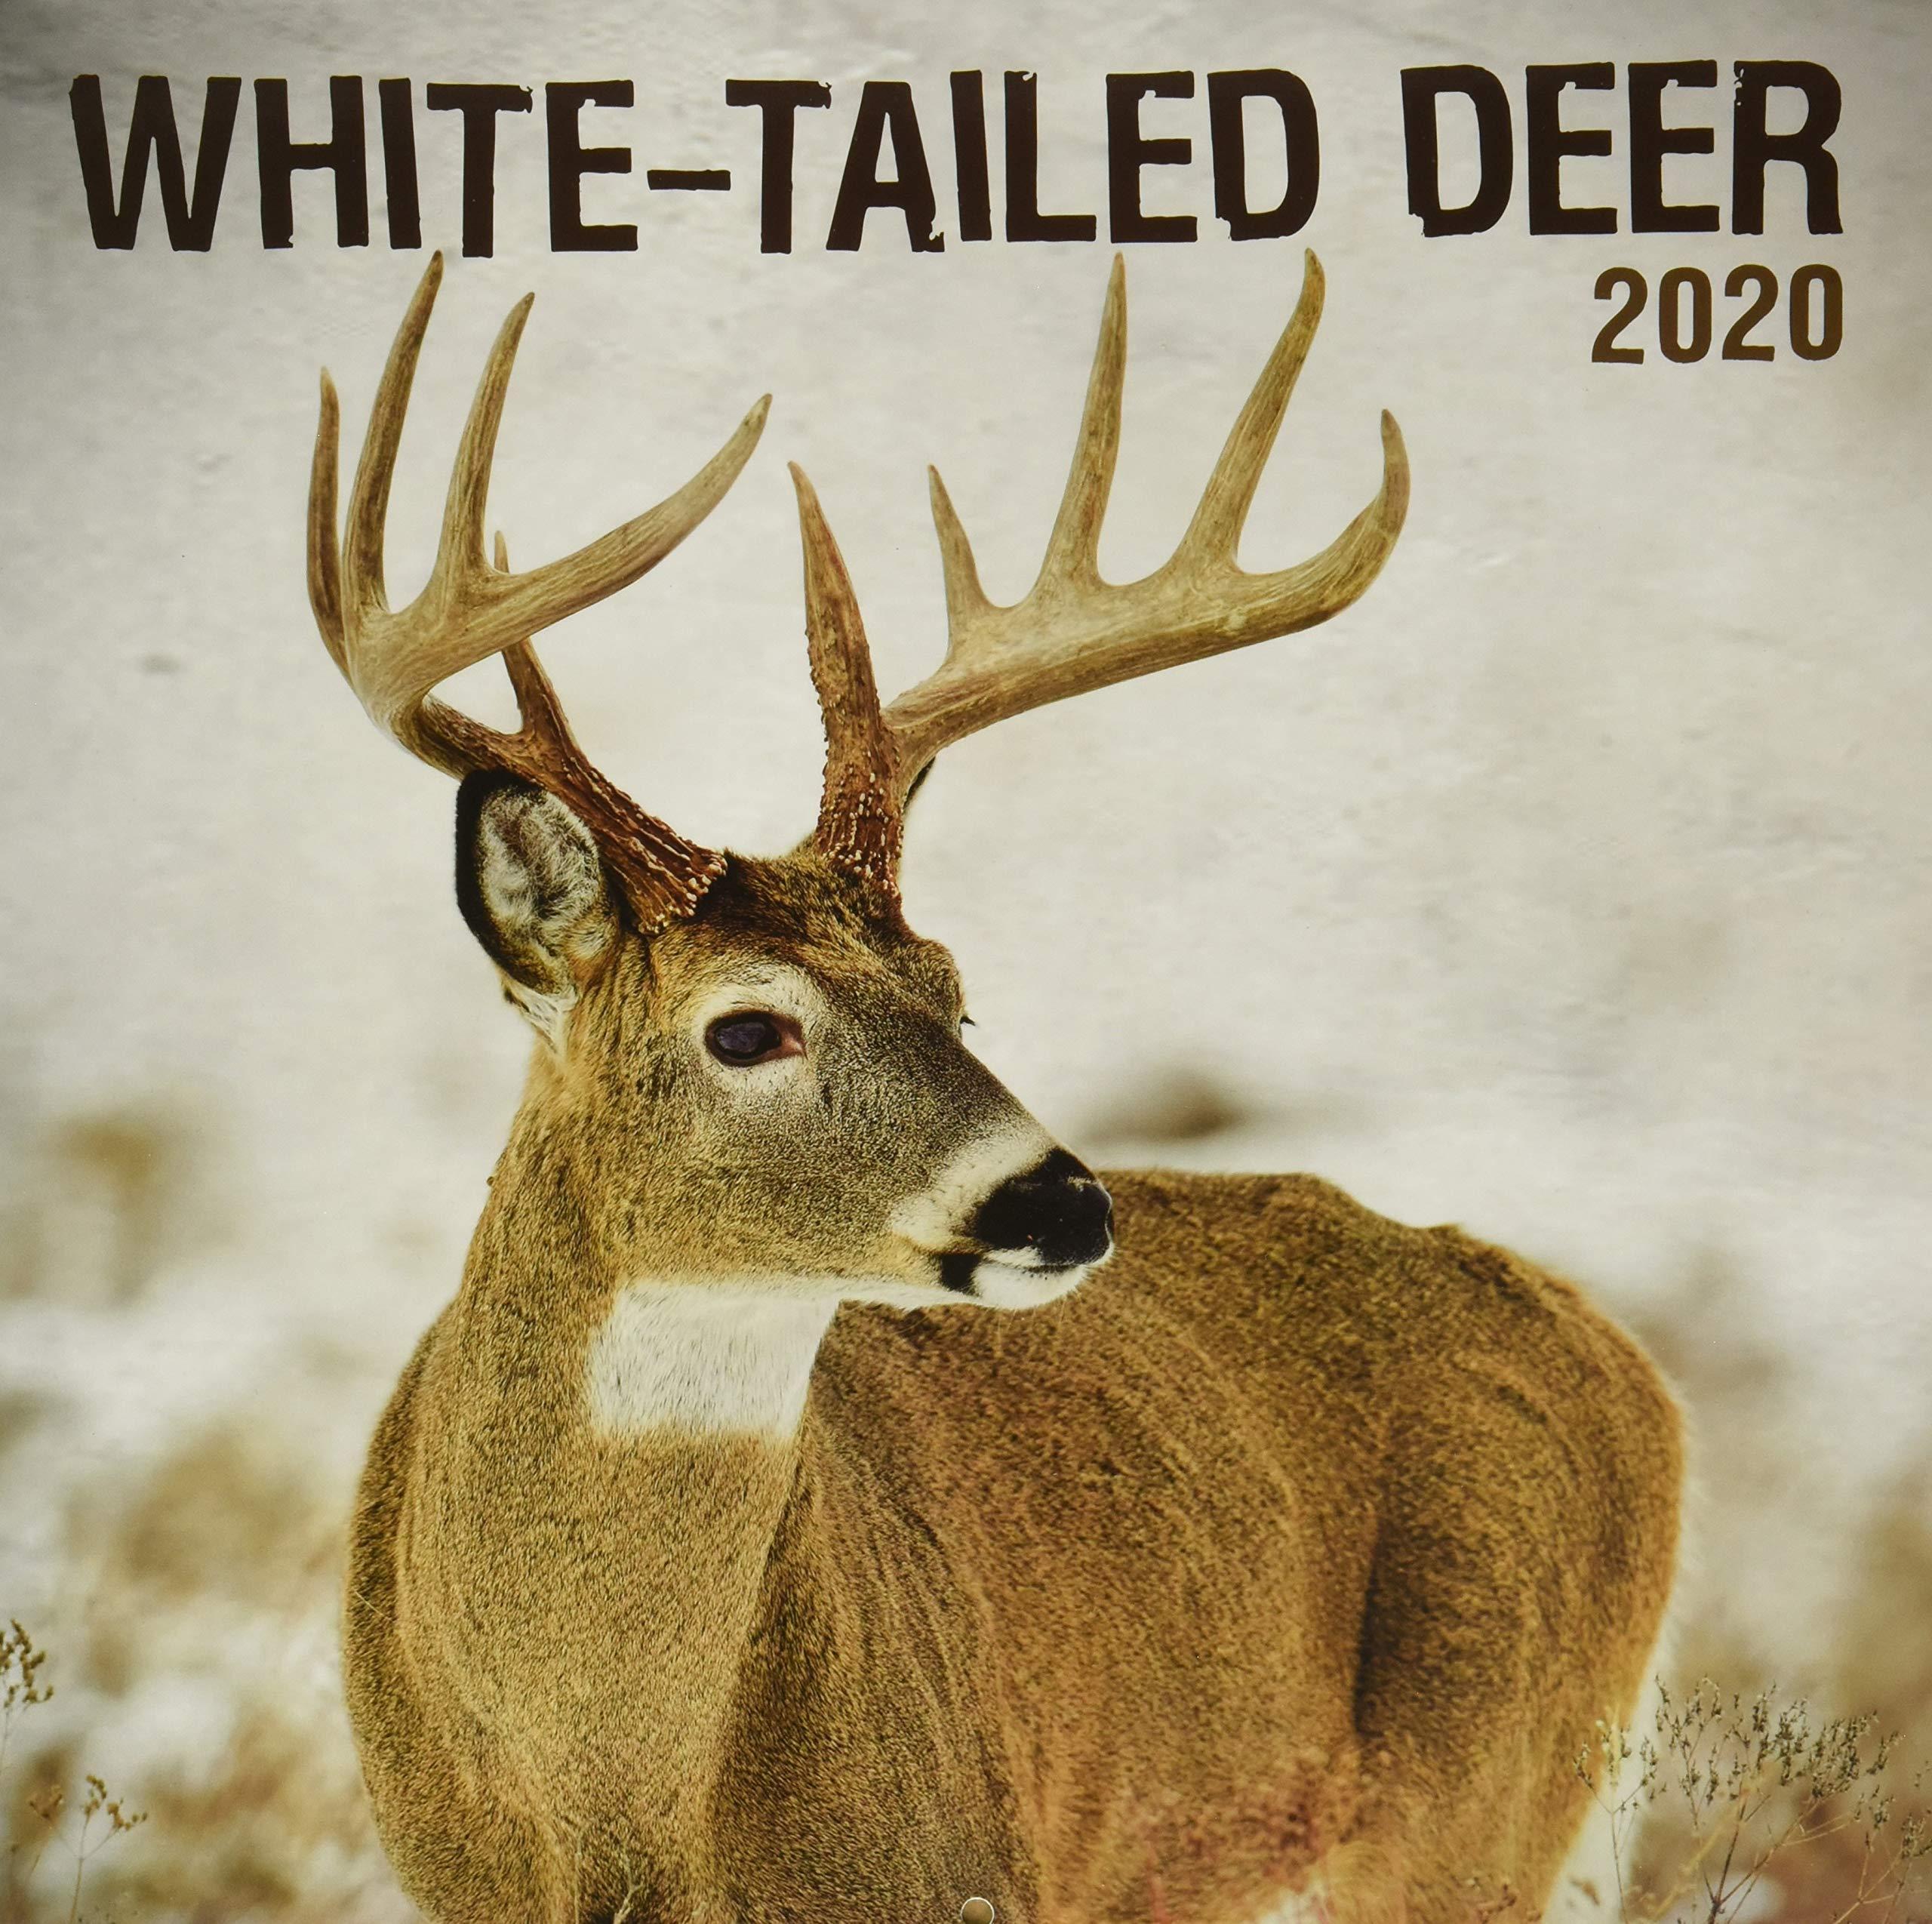 Deer Calendar 2020 White Tailed Deer 2020 Calendar: Inc. Lang Companies